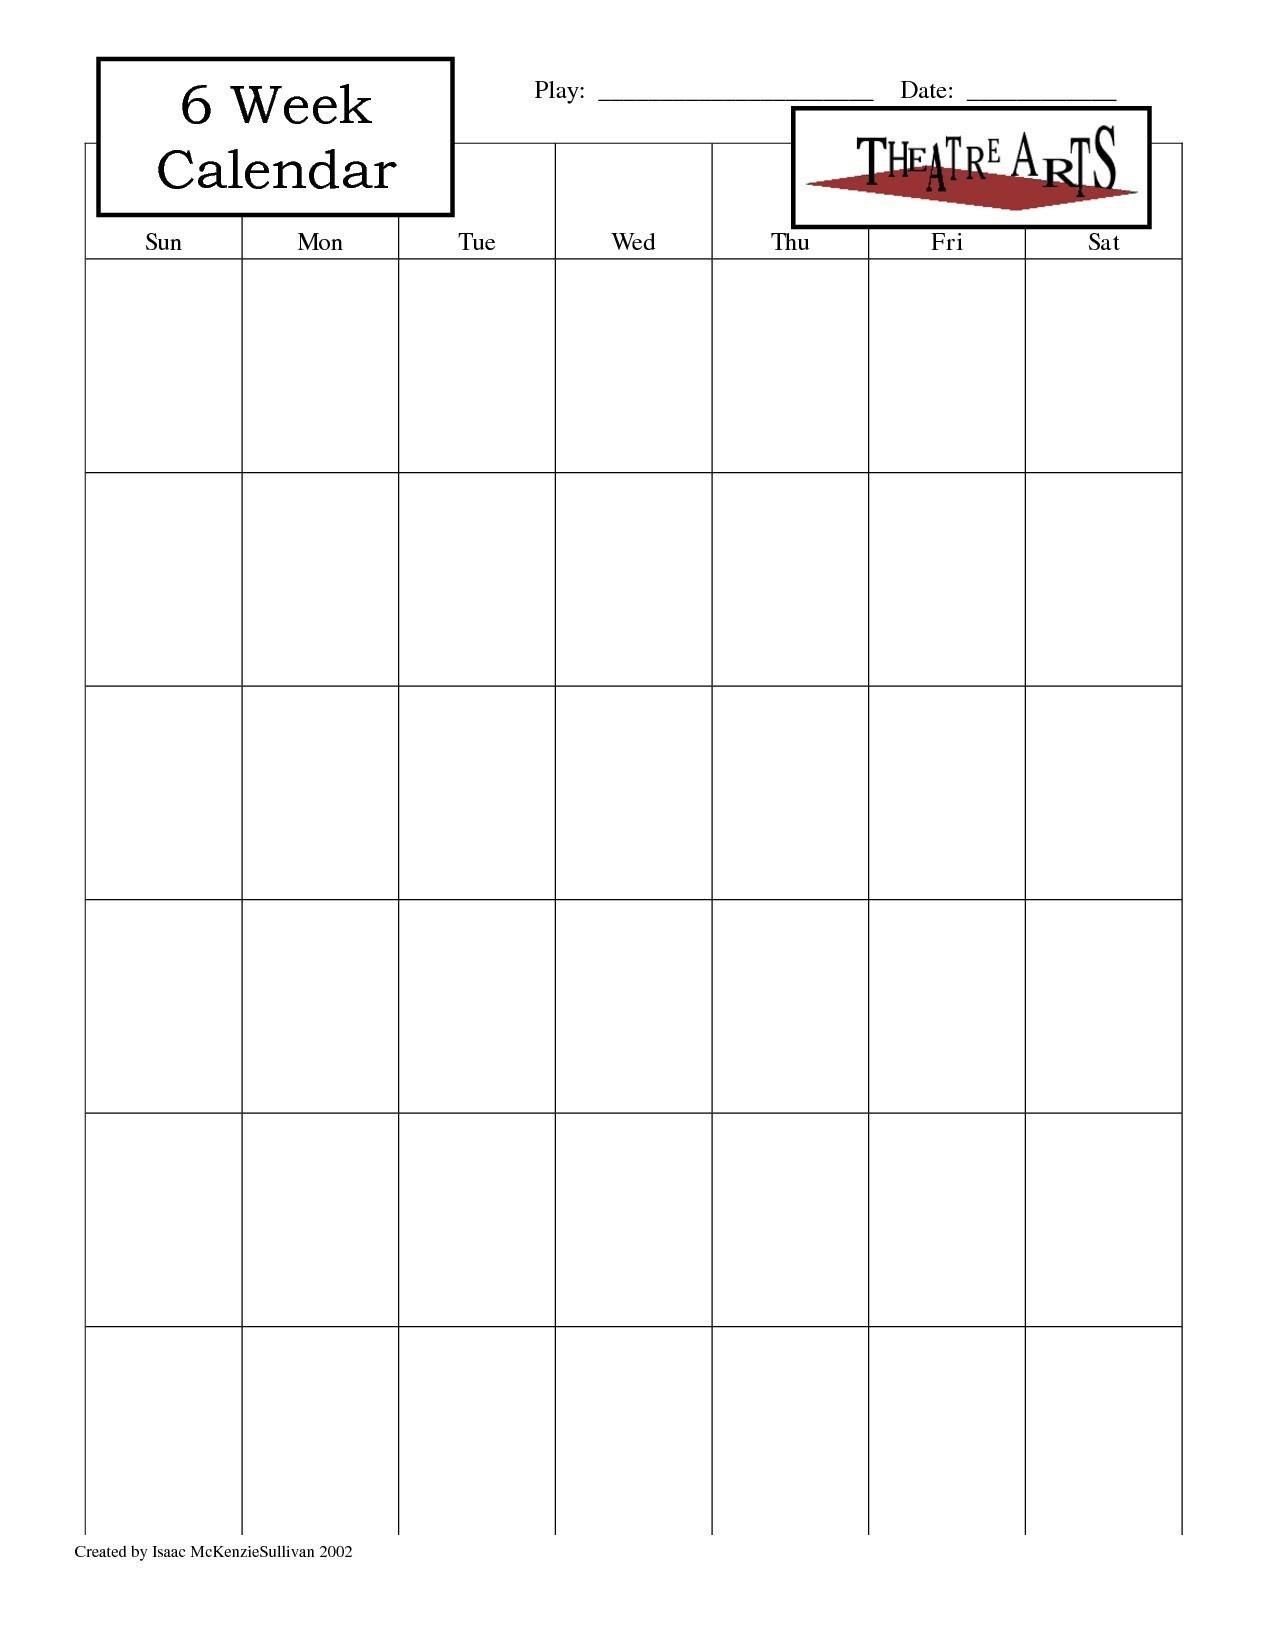 Blank 6 Week Calendar Template With Weeks 25971 Also On 6 Week for 6 Week Blank Calendar Template